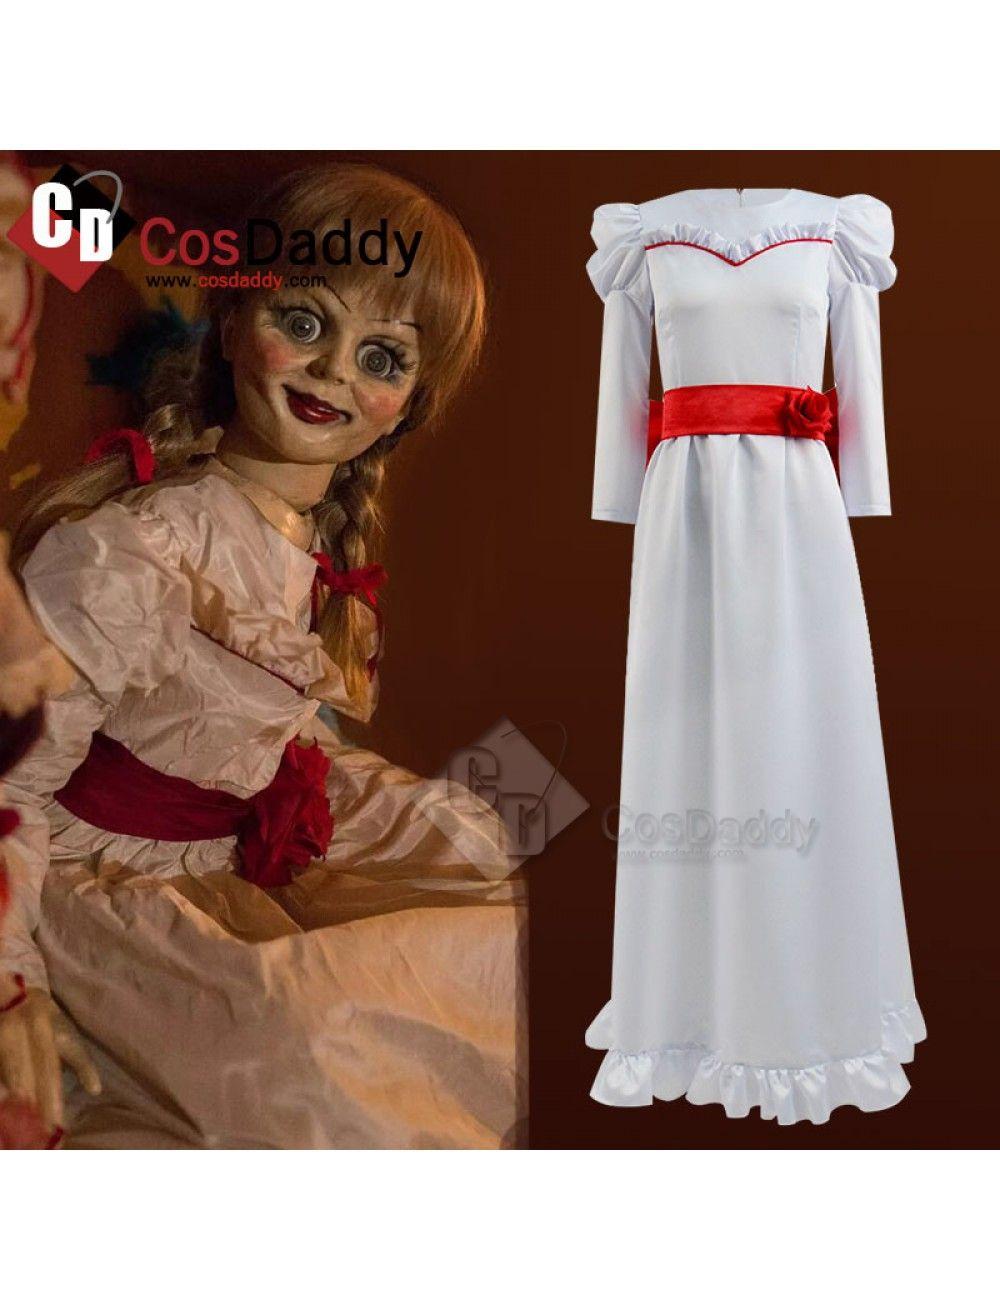 Annabelle Creation Halloween Horror Doll White Dress Cosplay Costume Fancy Dress